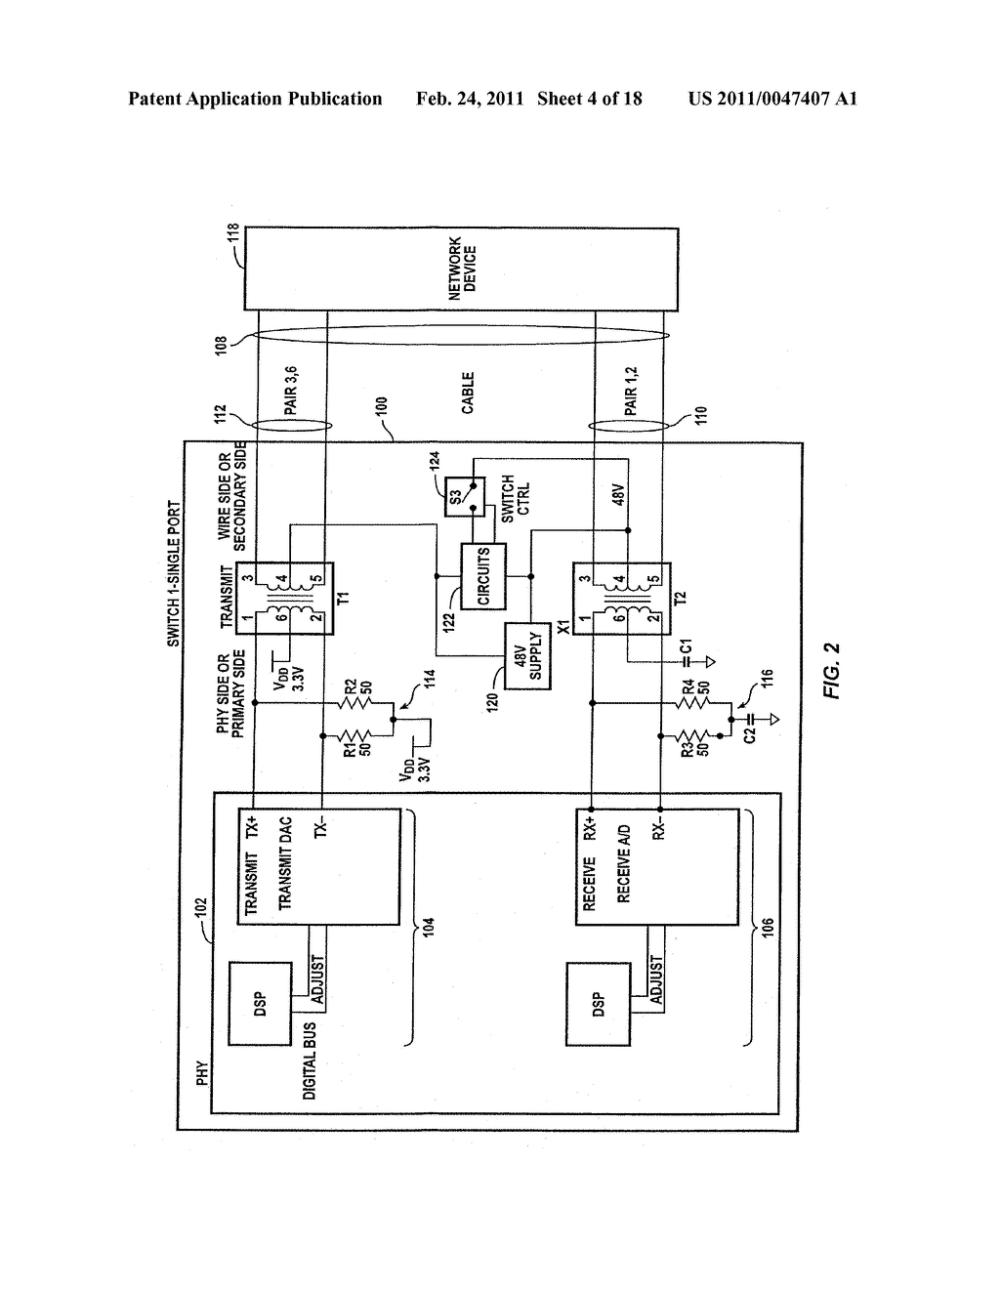 medium resolution of wiring closet diagram wiring diagrams wiring window diagram wiring closet diagram